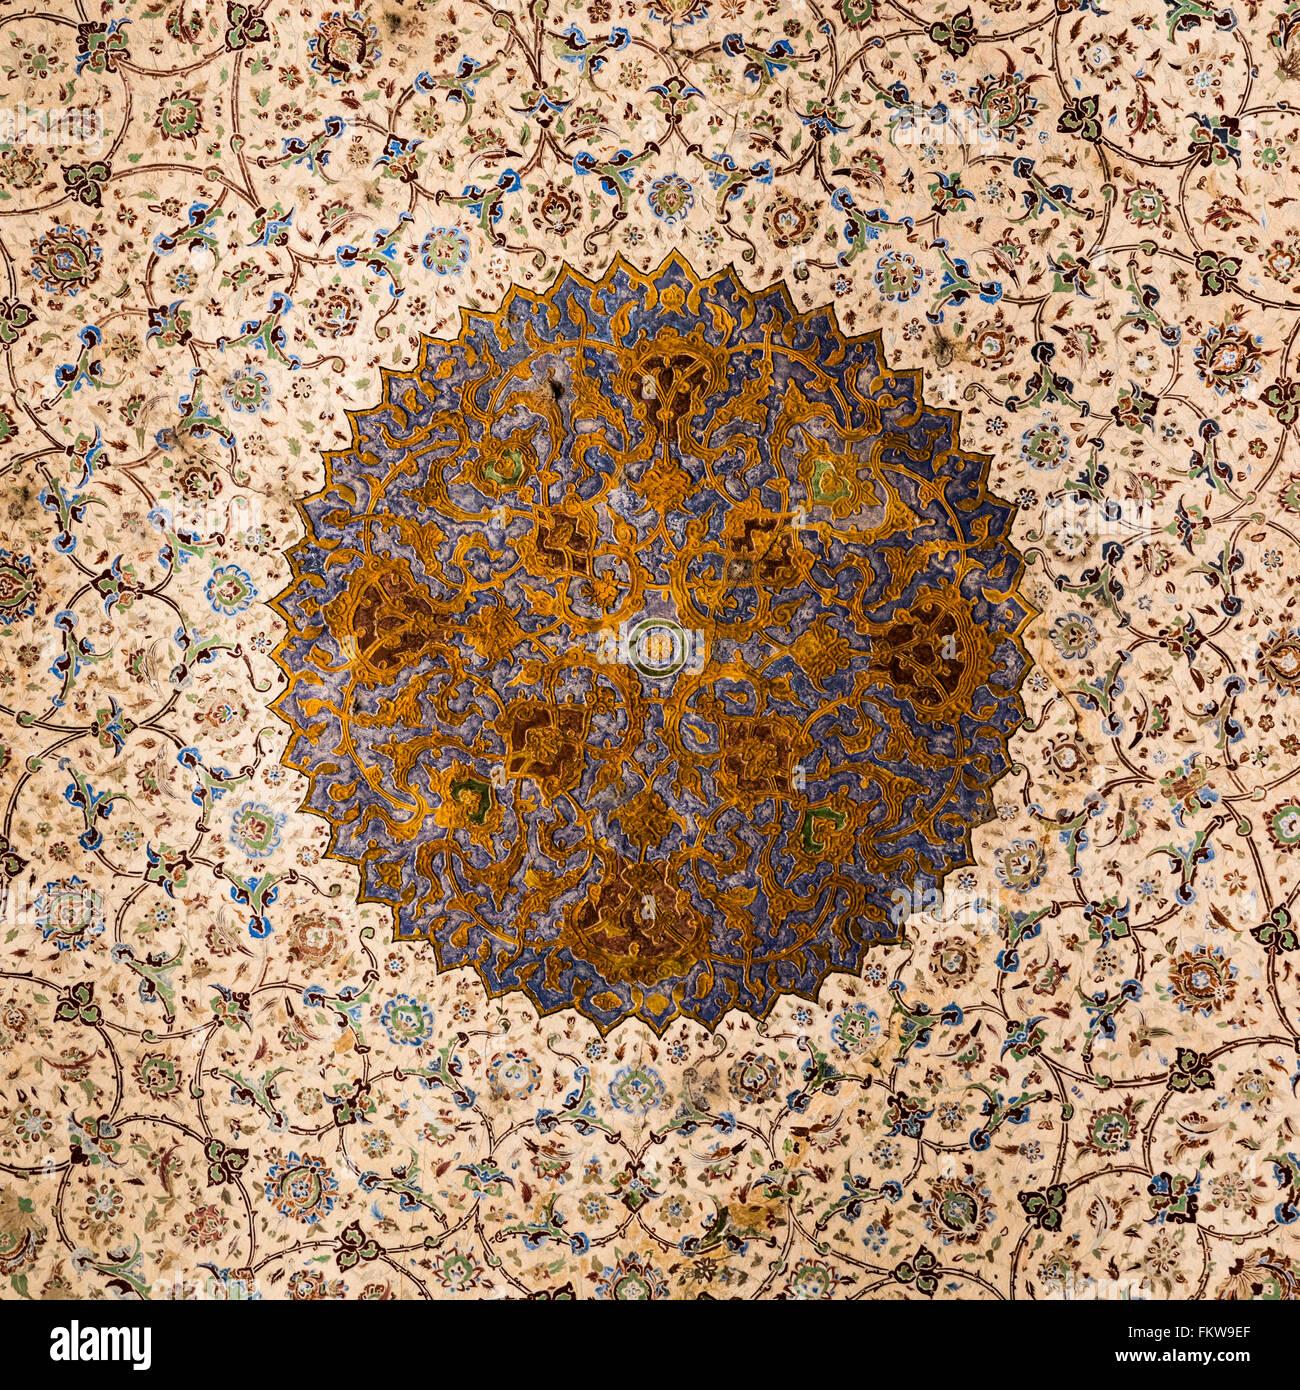 Mosaic tile dome, Qapu Palace, Maydan-e Imam, Esfahan, Iran Stock Photo